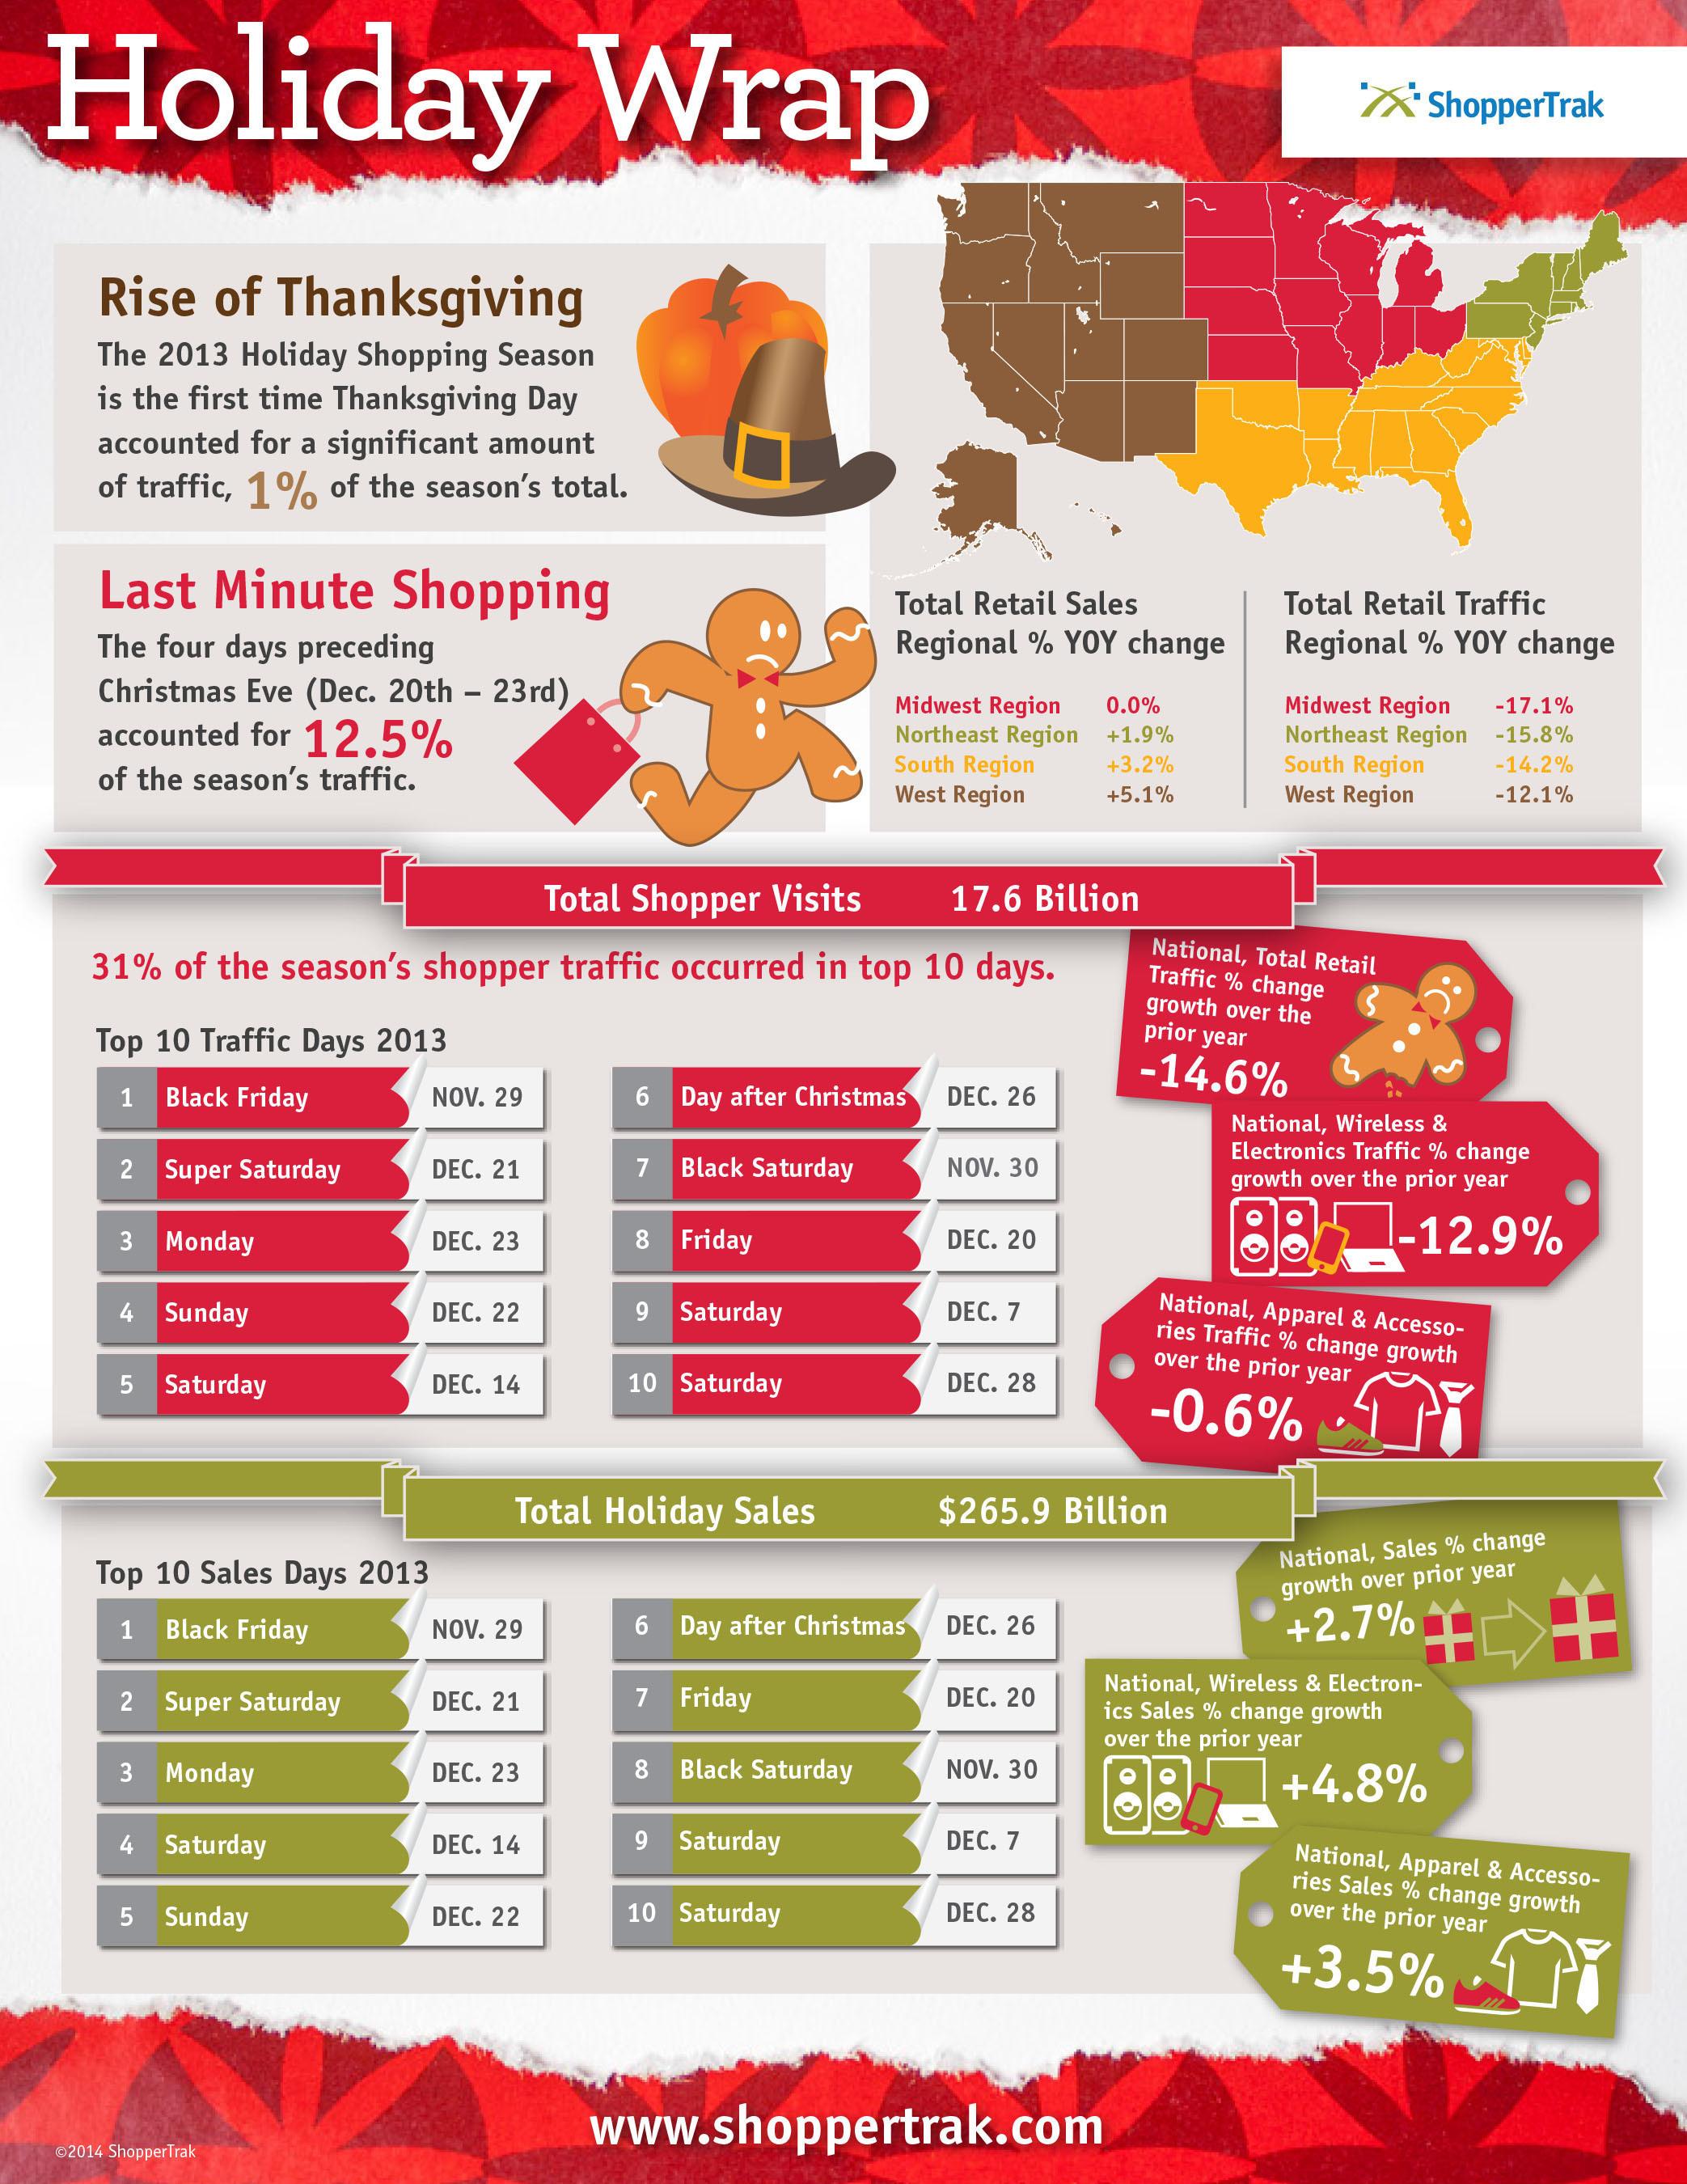 ShopperTrak 2013 Holiday Wrap. (PRNewsFoto/ShopperTrak) (PRNewsFoto/SHOPPERTRAK)